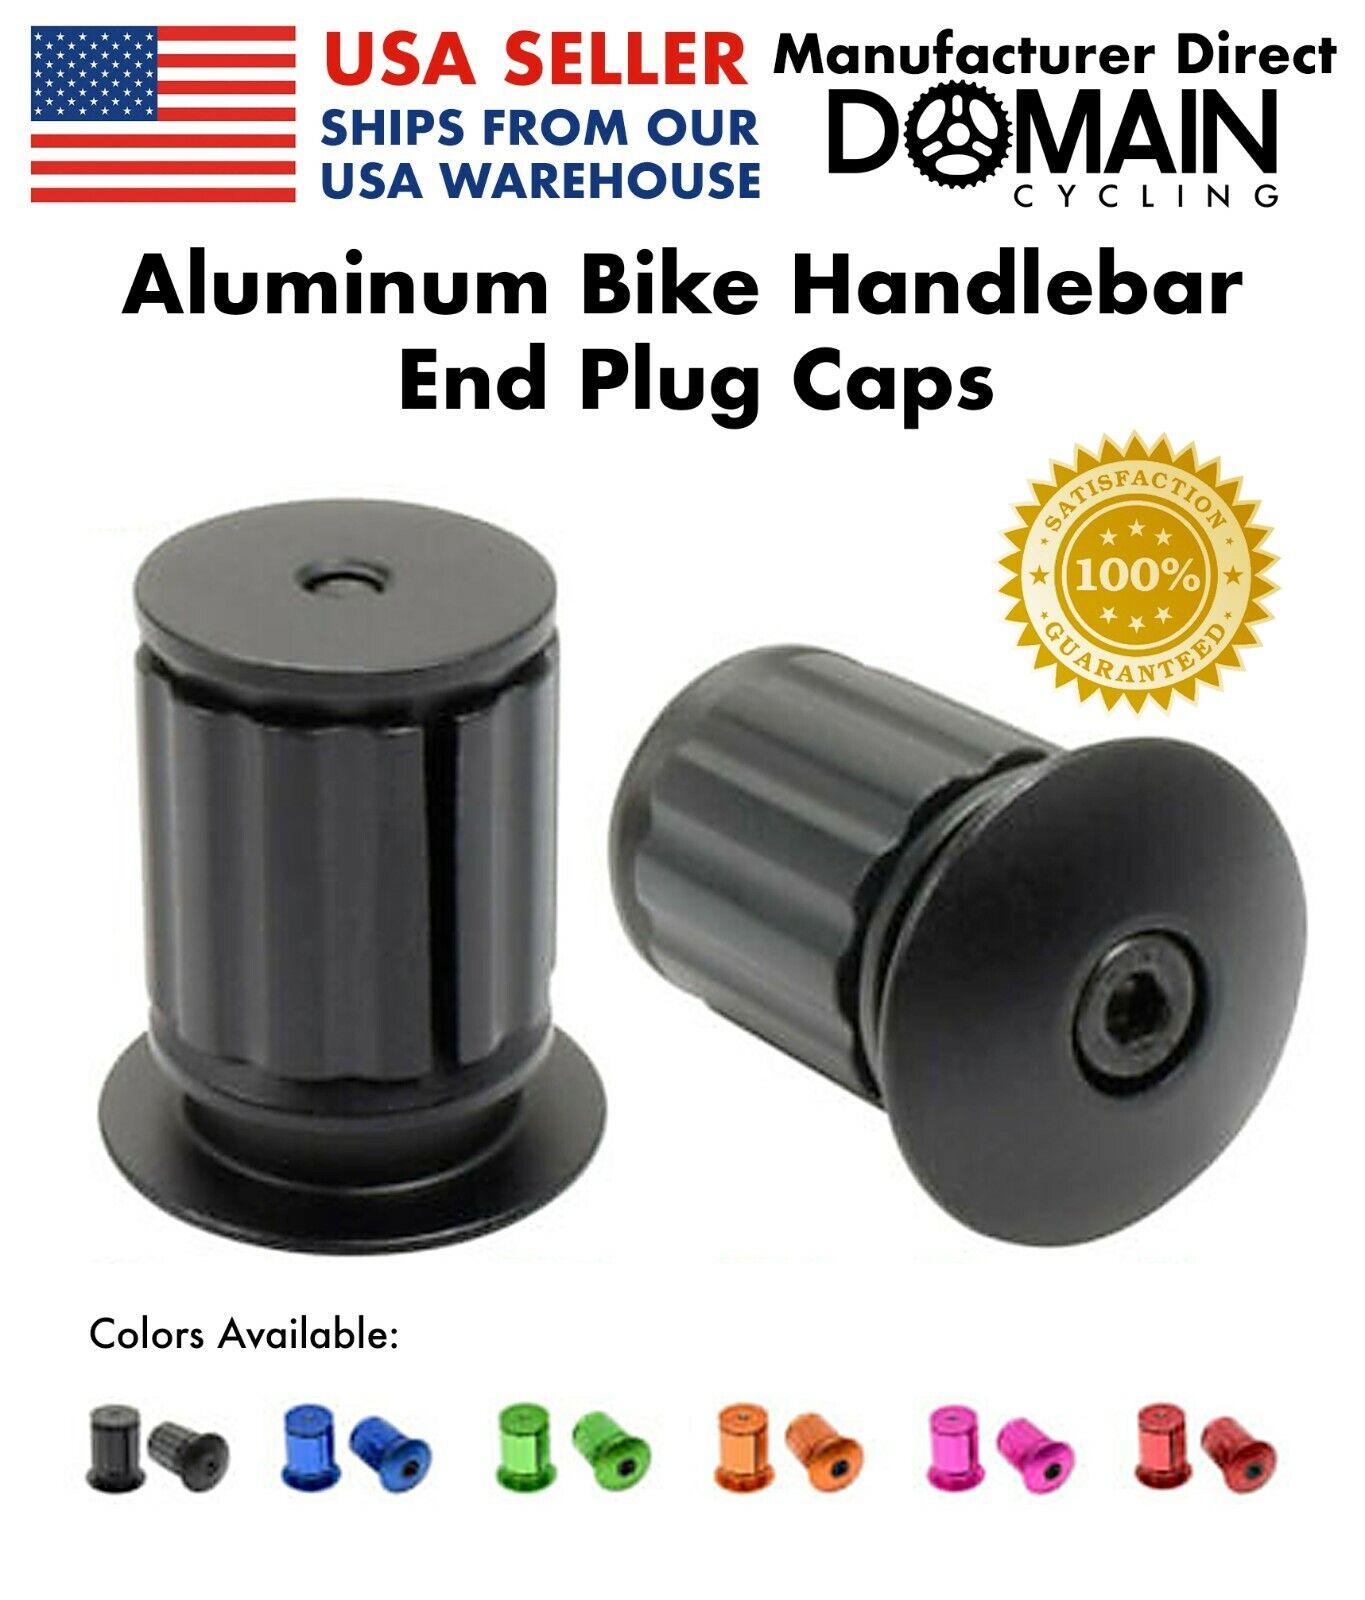 1 Pair Bicycle End Plugs Caps Rubber Bike Handlebar Grips Black Handle Covers